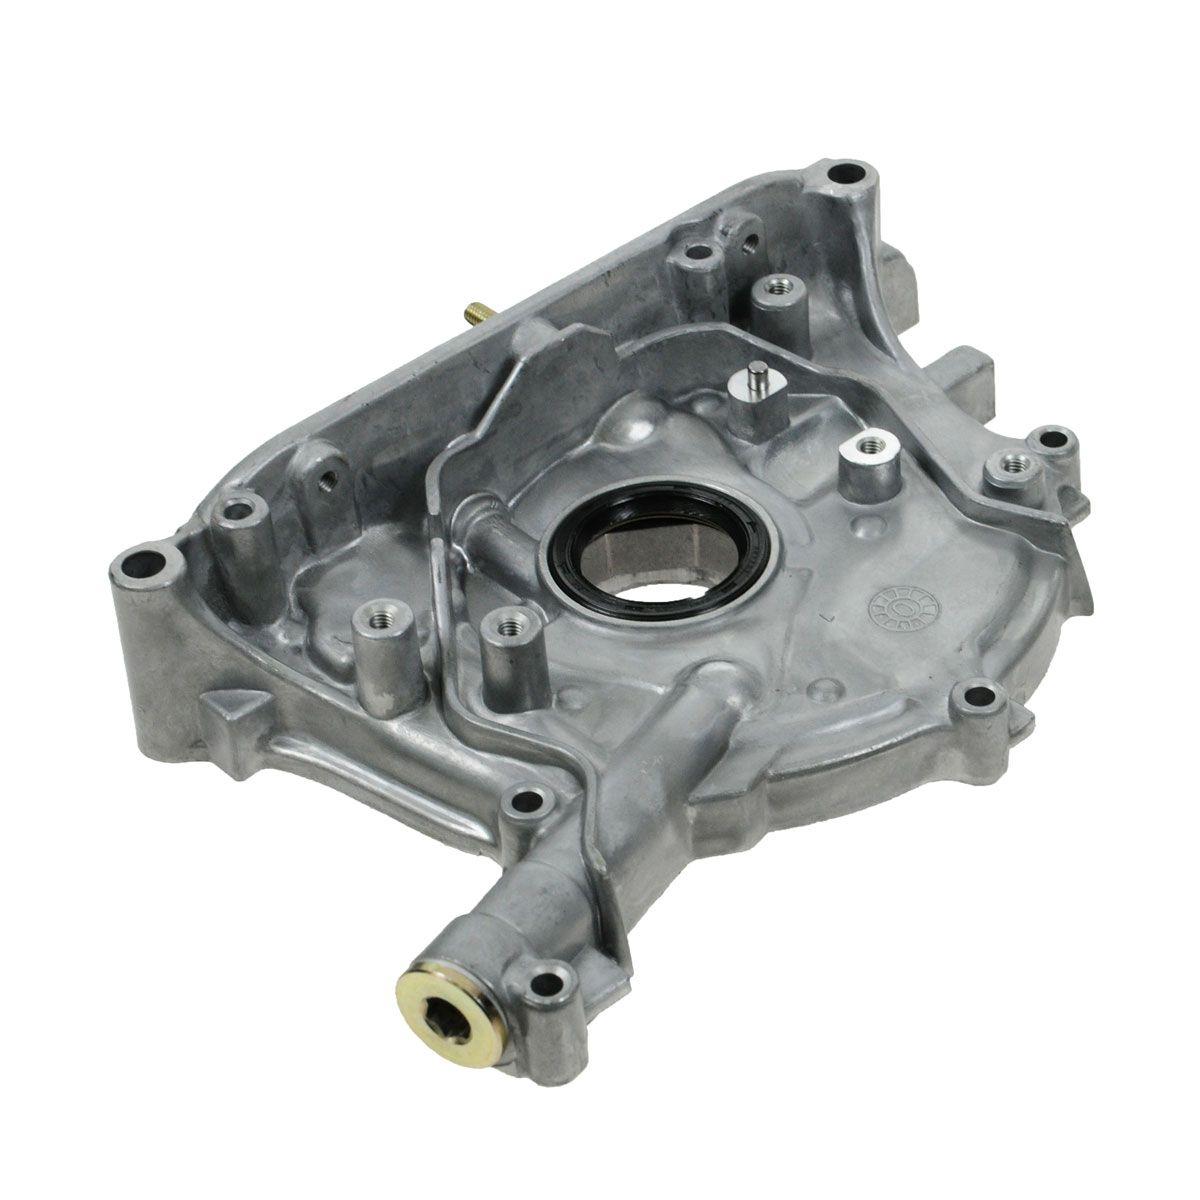 Engine Oil Pump Assembly For Honda Civic Del Sol 1 6l Crv